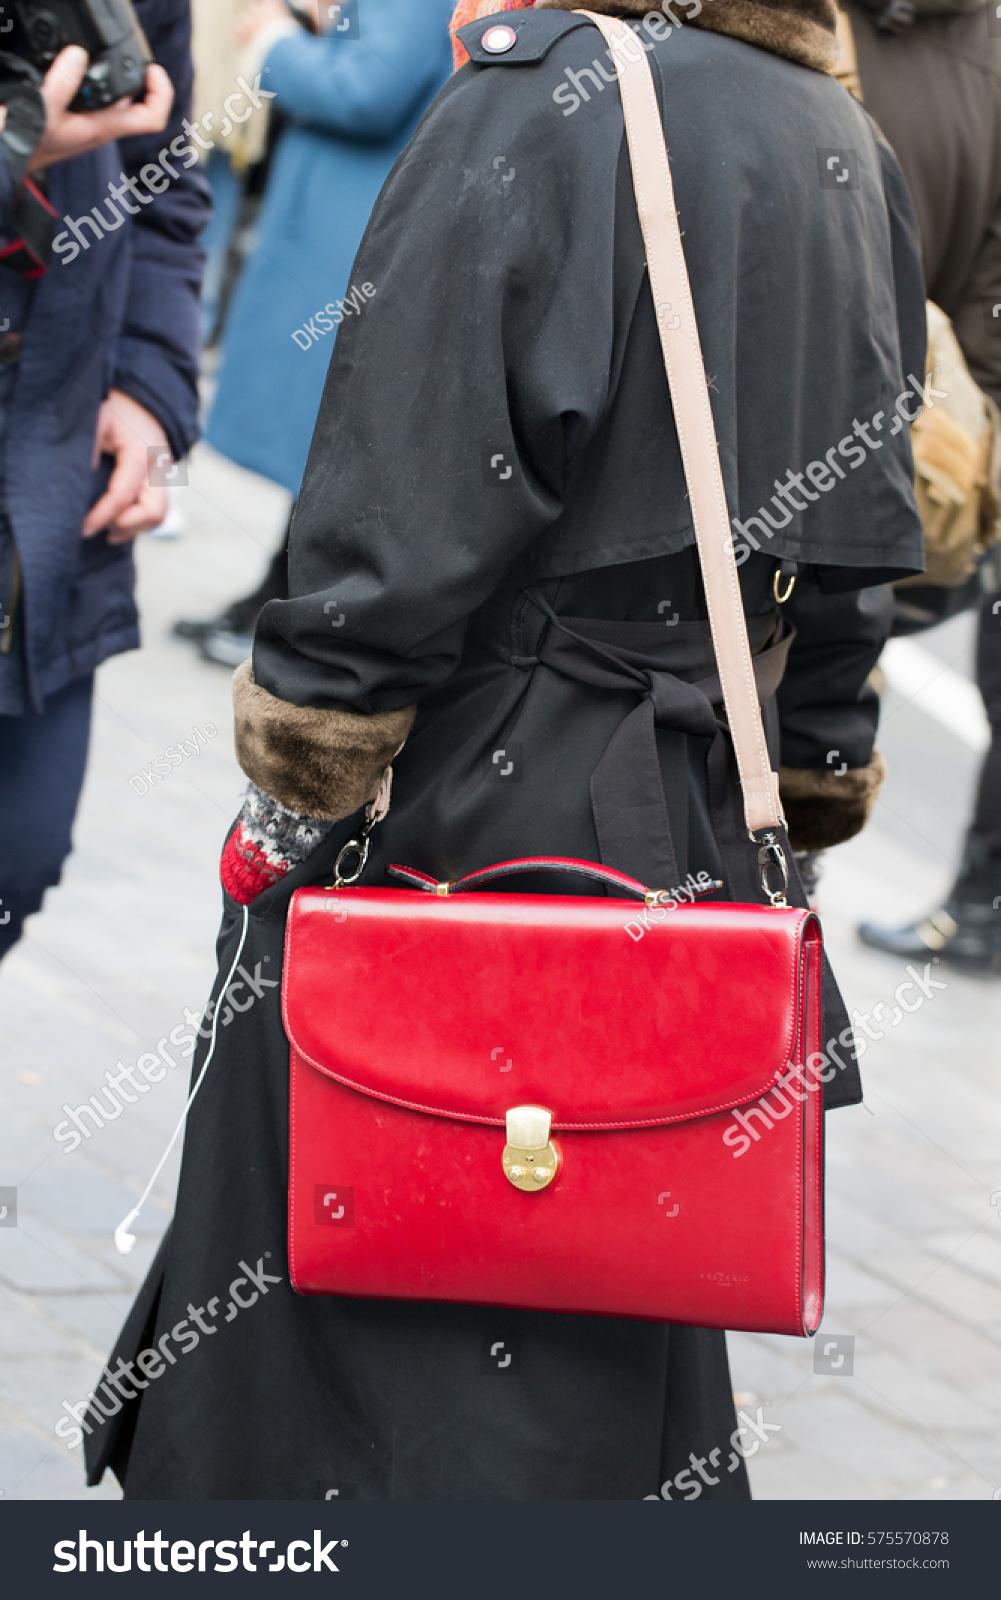 8904edb29c600 Parisjanuary 23 2015 Street Fashion Bag Stock Photo (Edit Now) 575570878